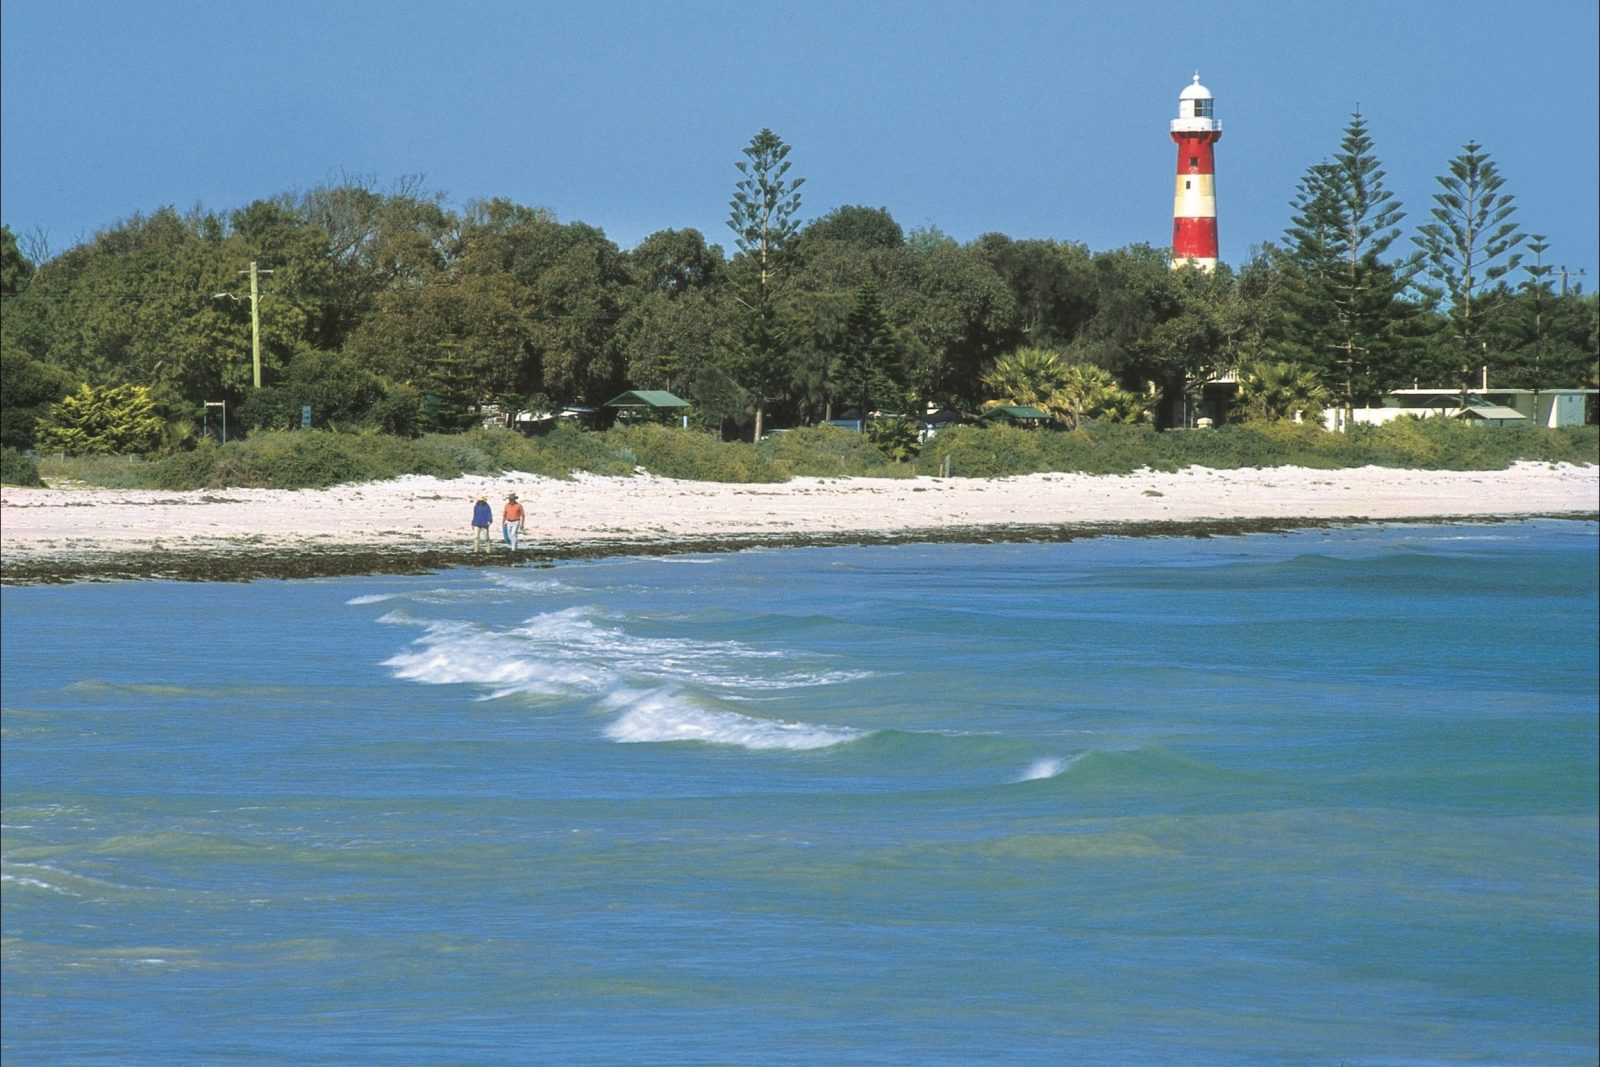 Pages Beach, Geraldton, Western Australia